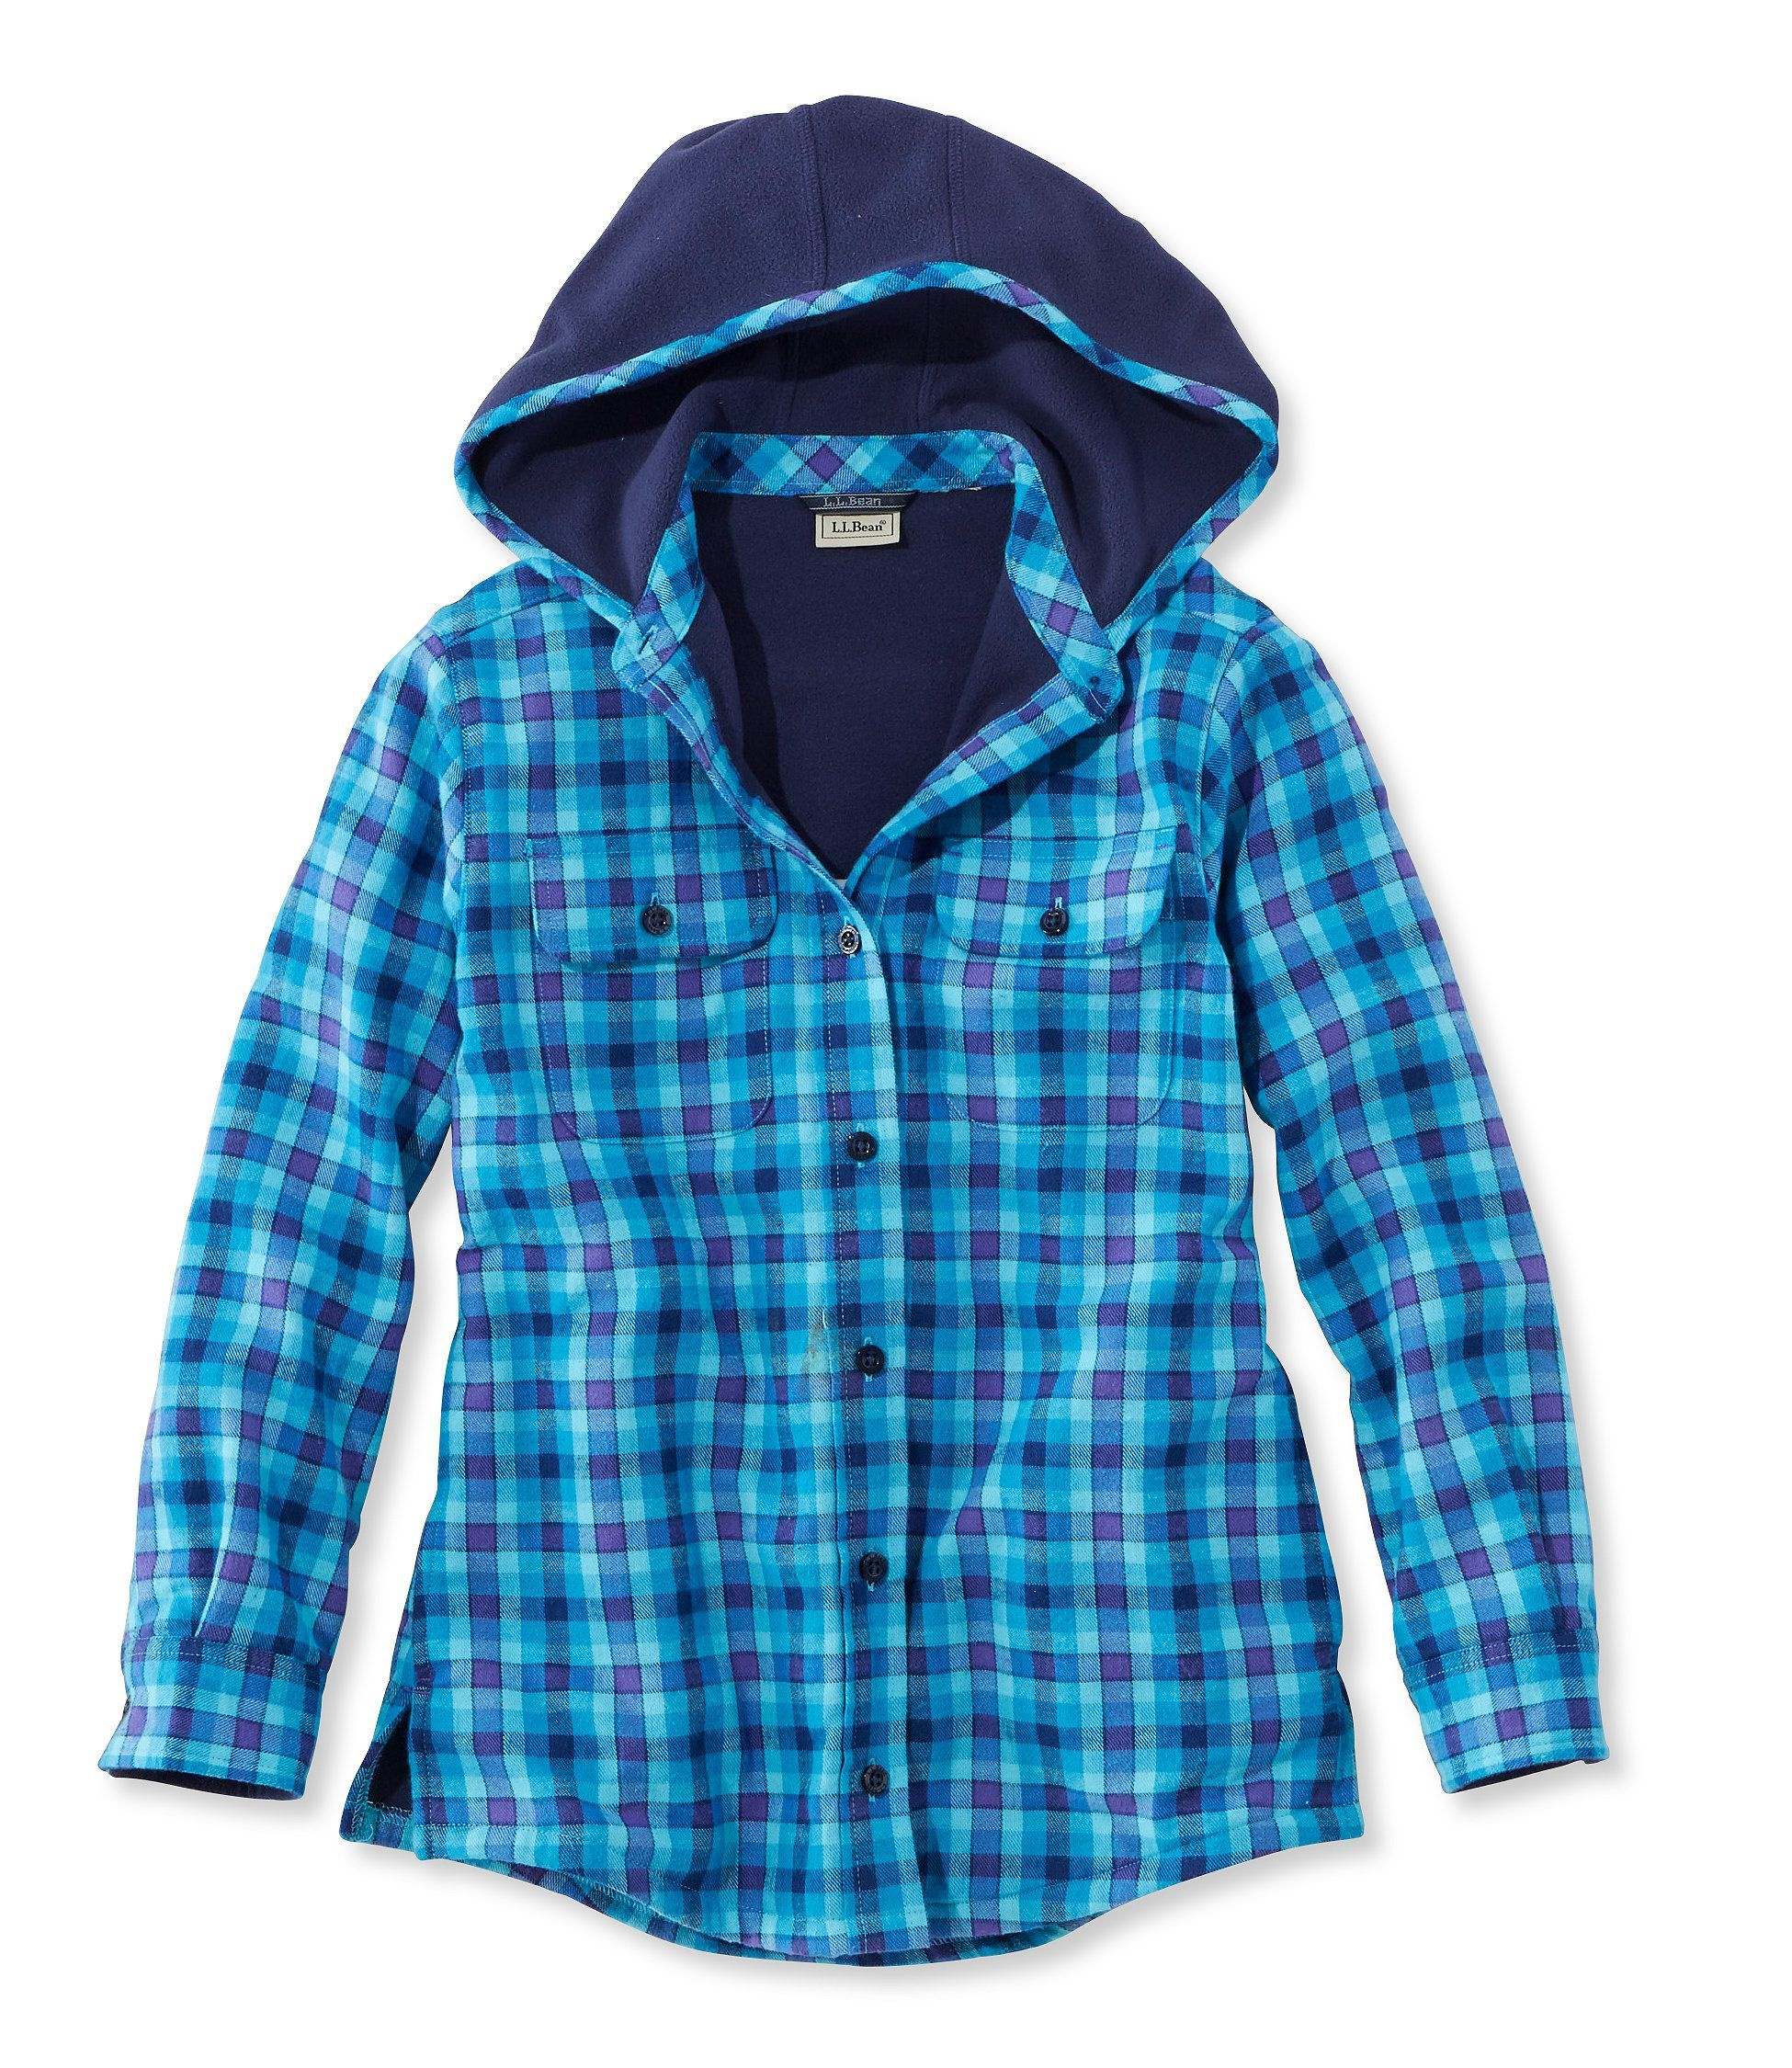 Flannel jackets with hood  Girlsu FleeceLined Flannel Shirt  Products  Pinterest  Flannel